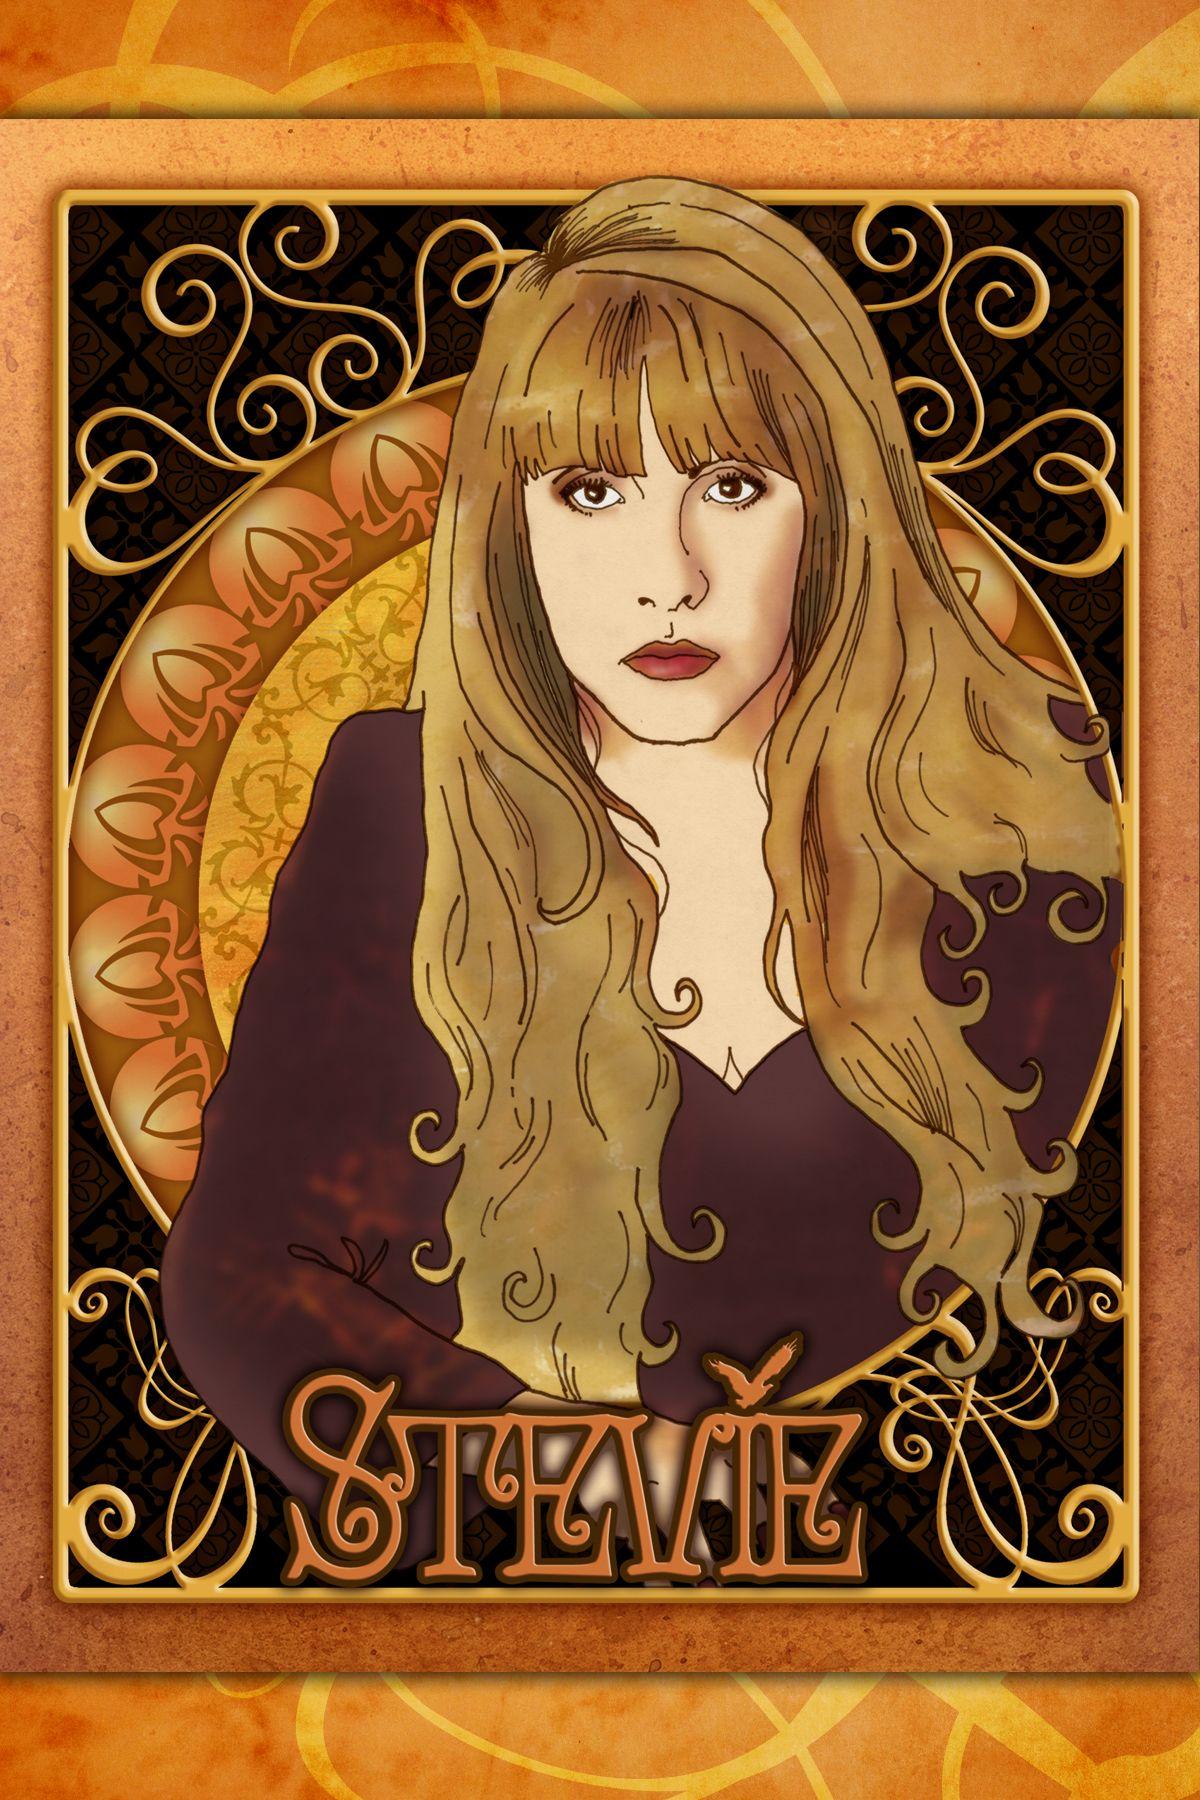 Stevie Nicks Stevie Nicks Fleetwood Mac Stevie Nicks Stevie